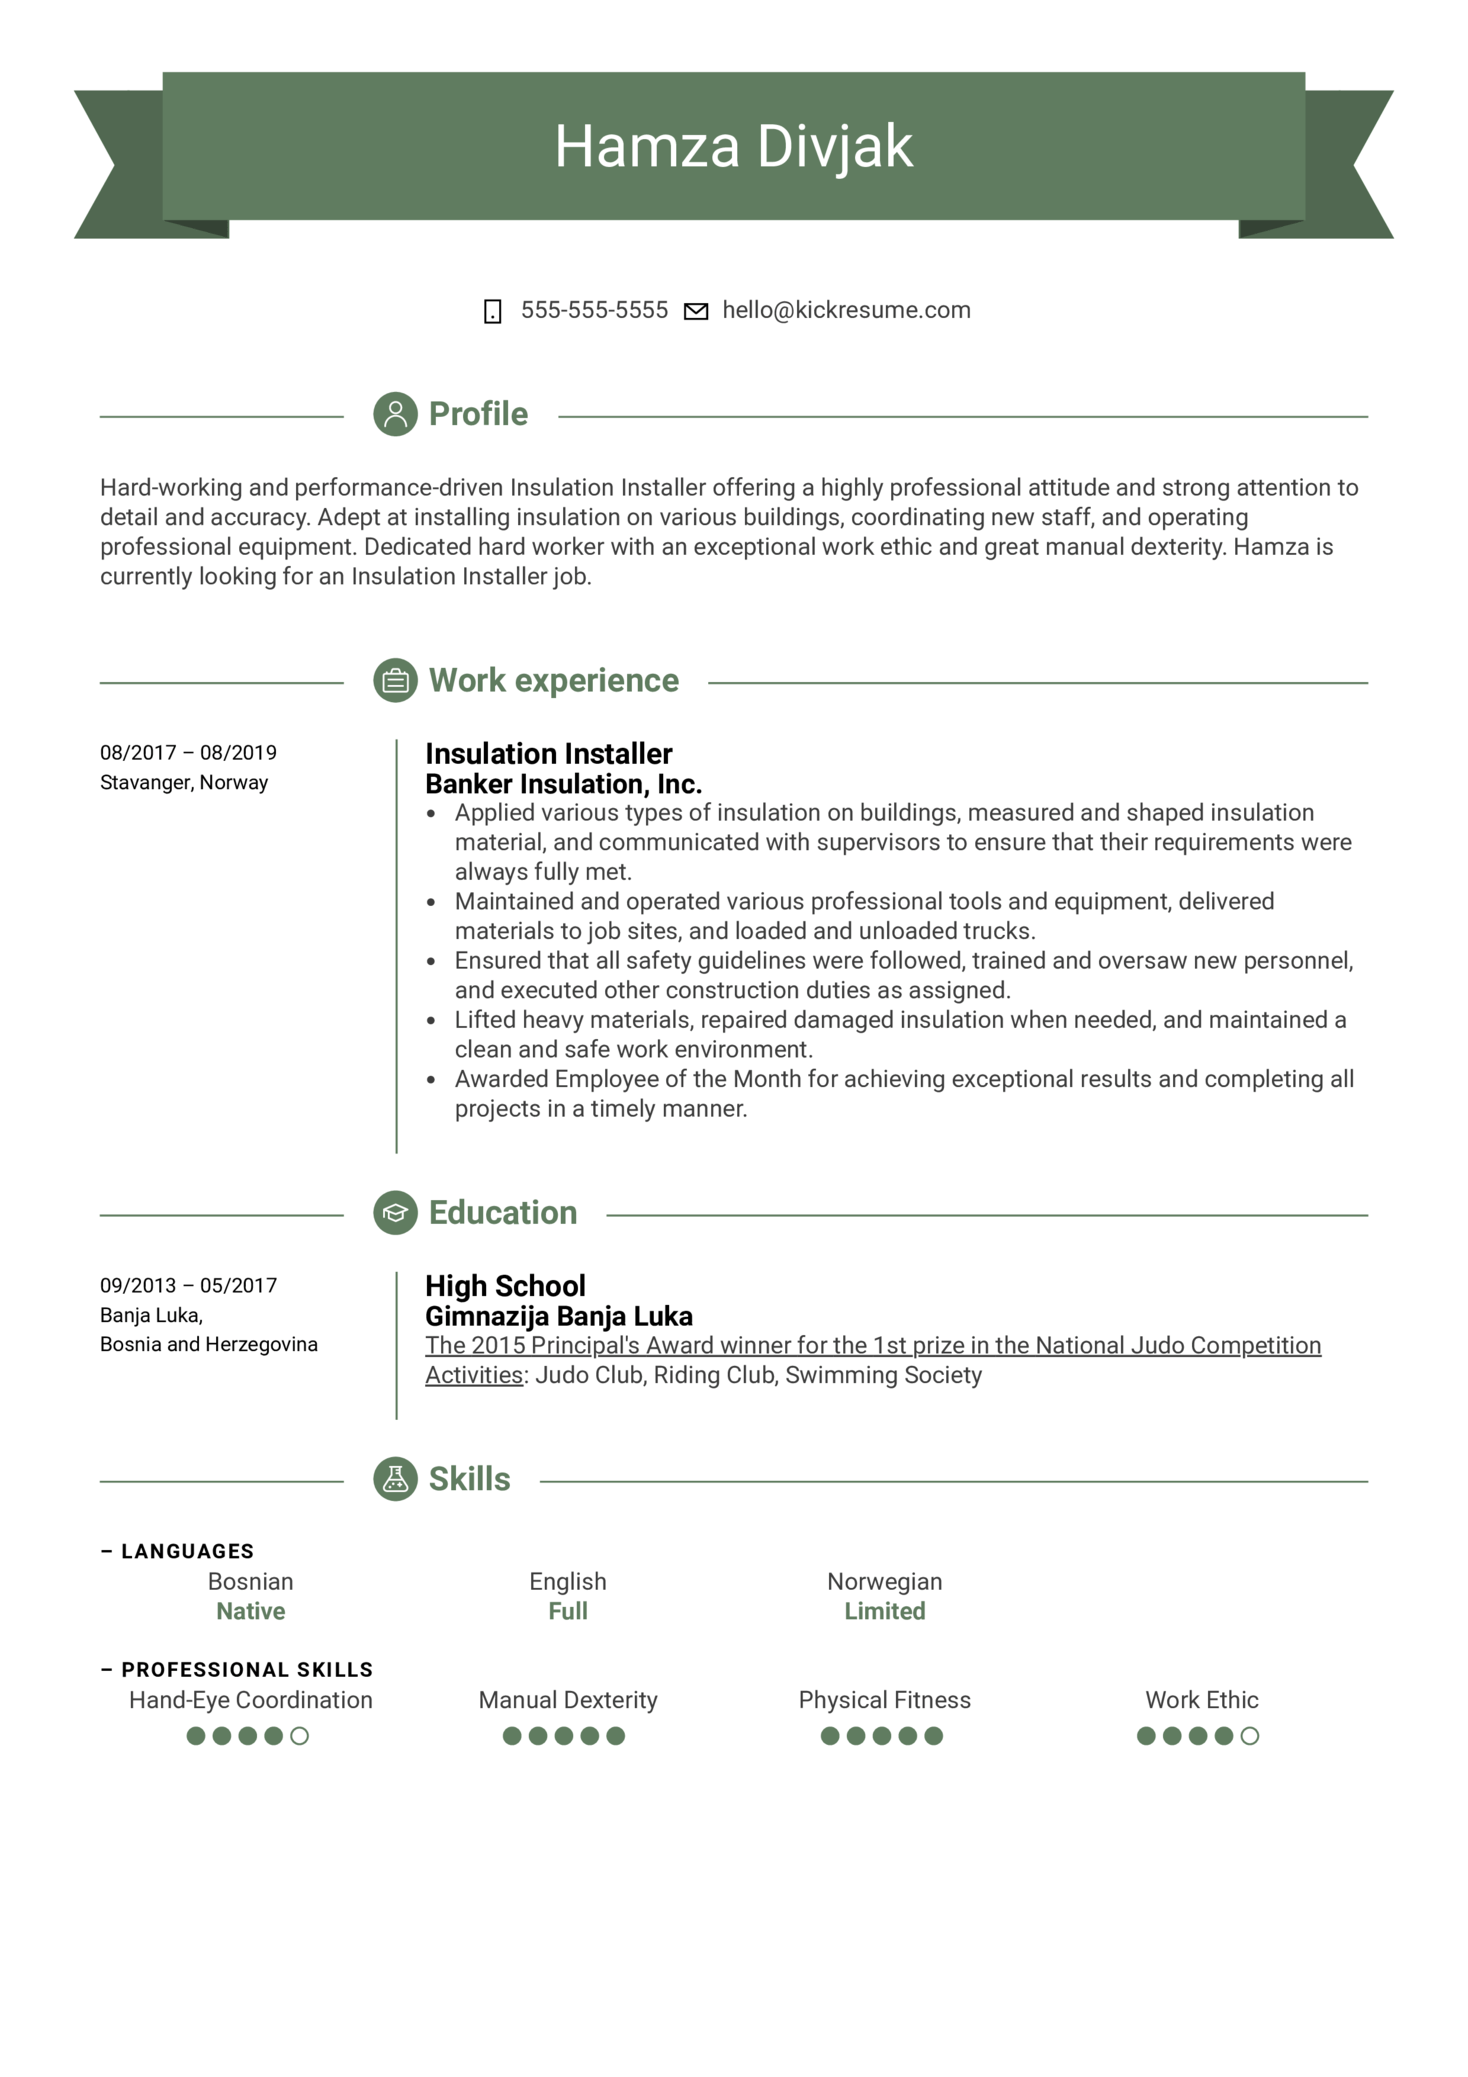 Insulation Installer Resume Example (parte 1)